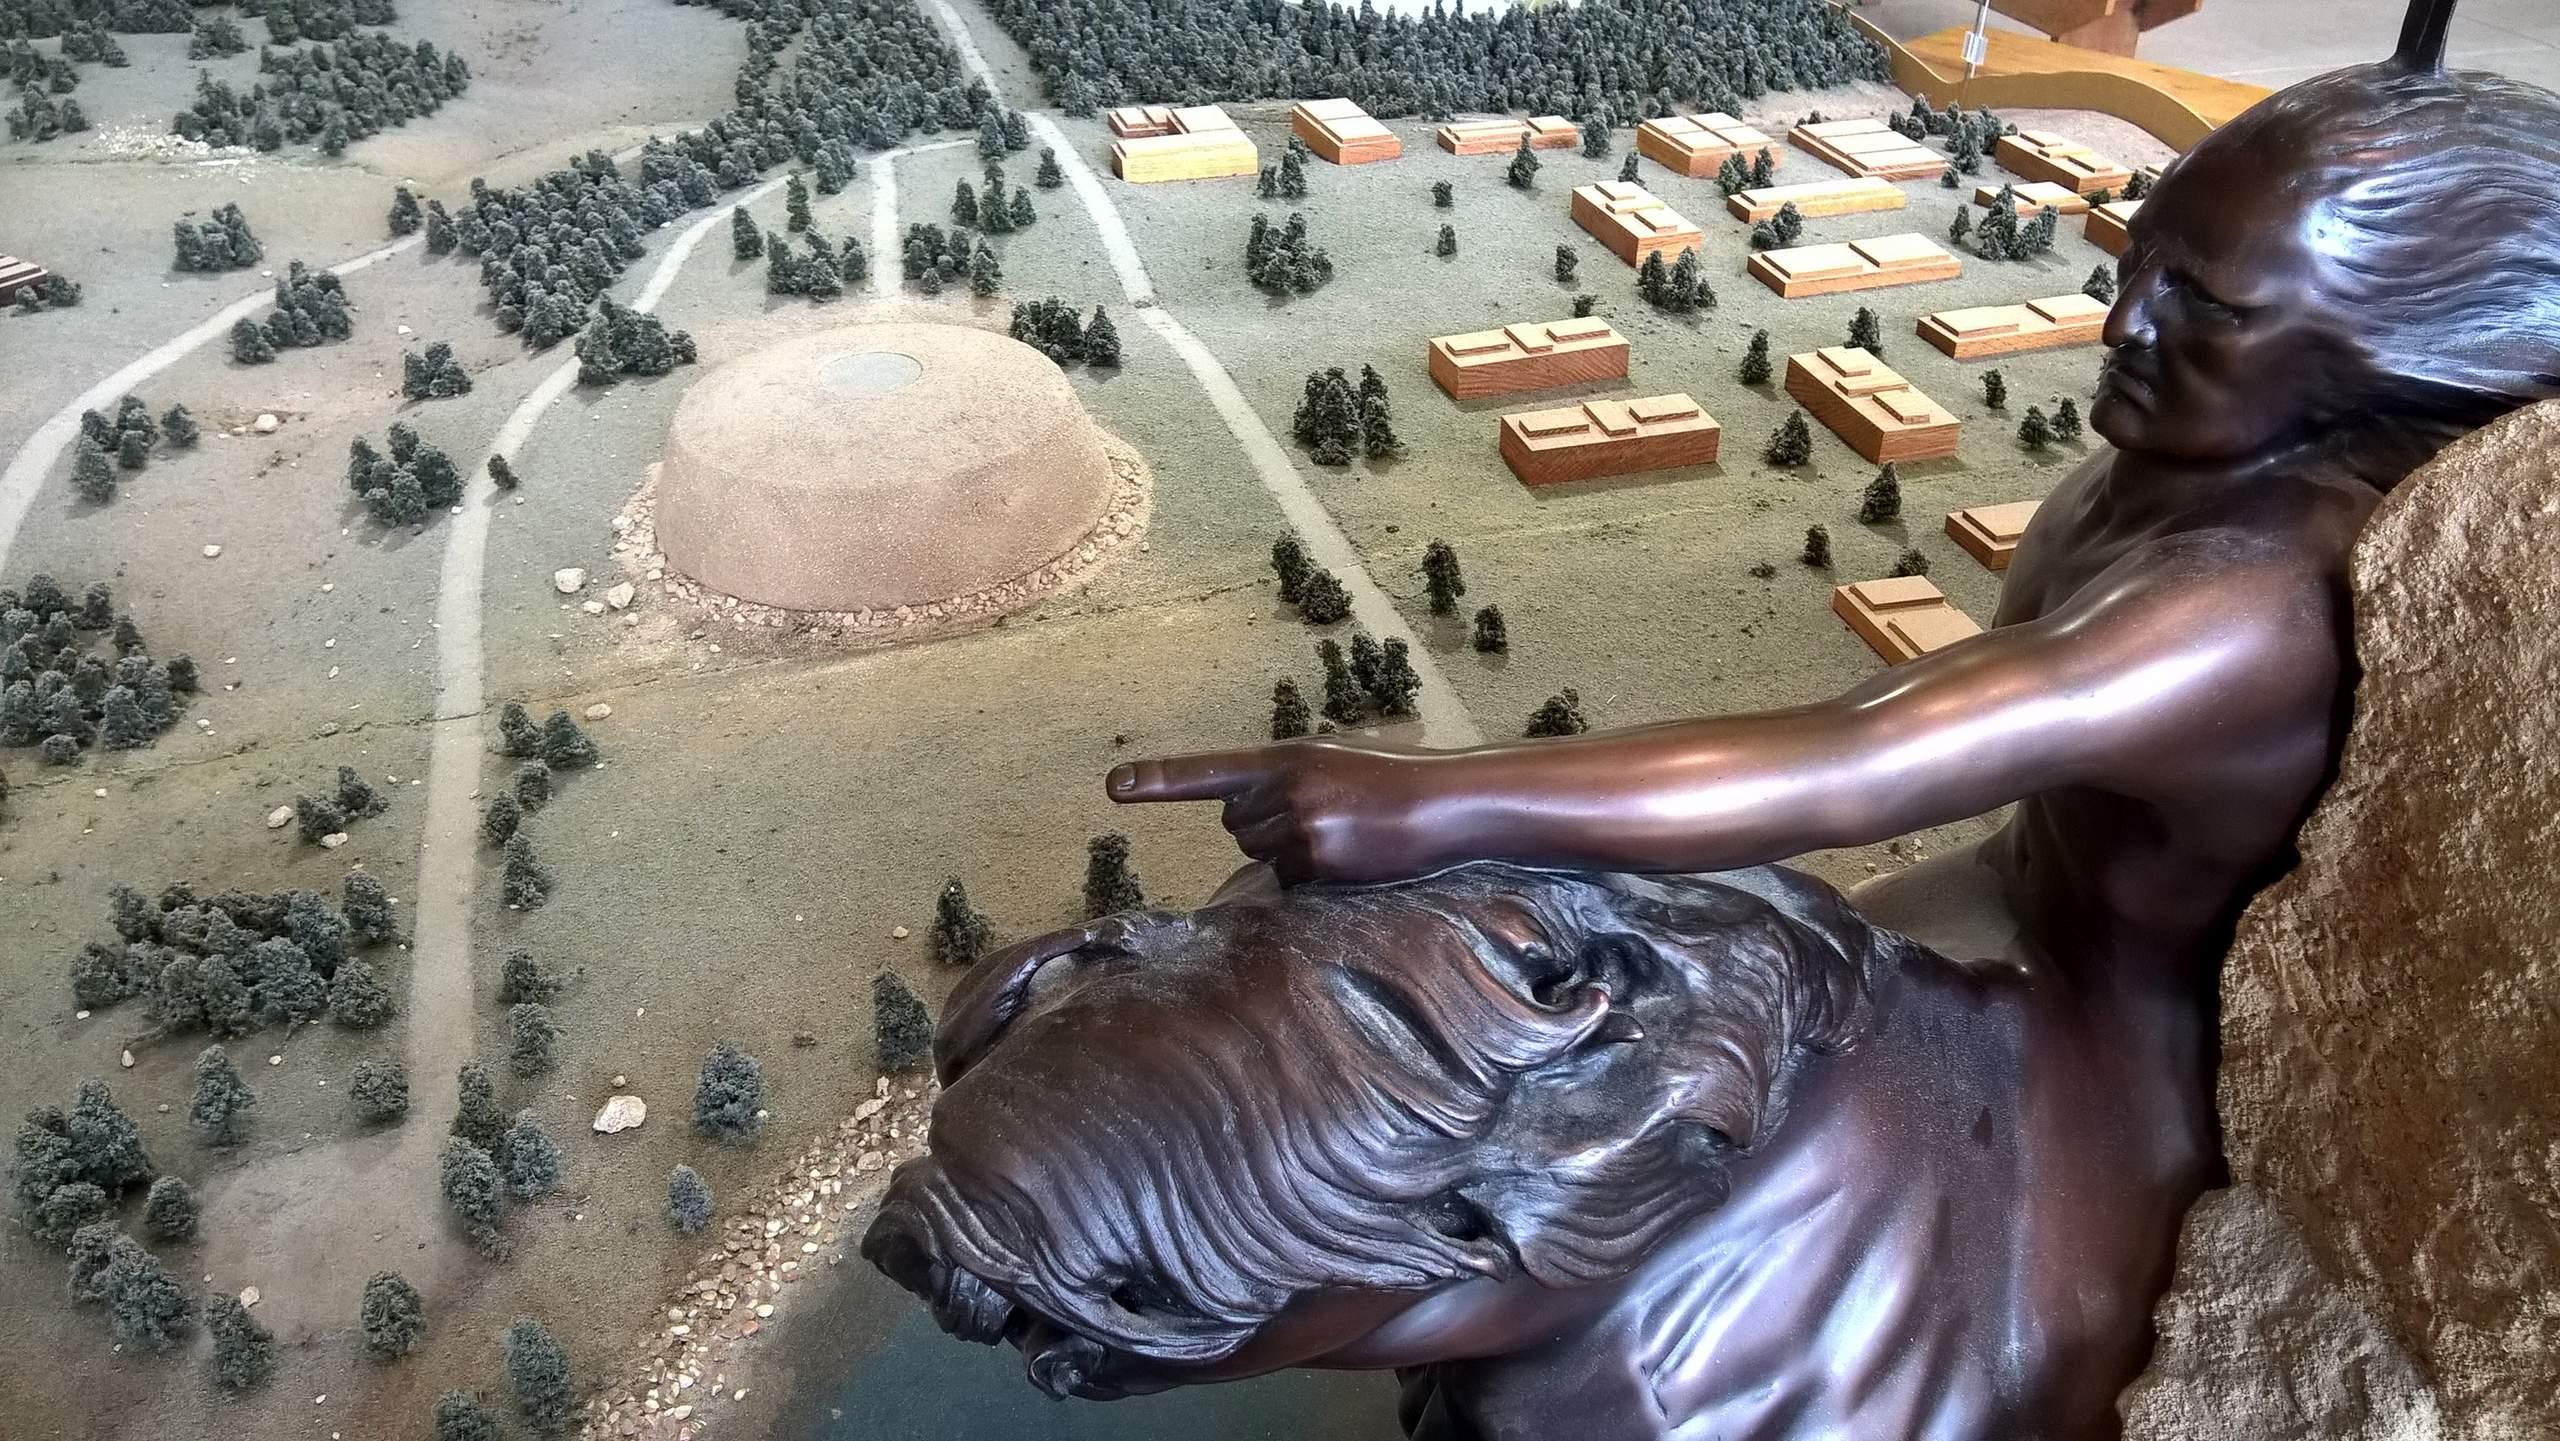 University Of Colorado Medical Center >> Crazy Horse Memorial